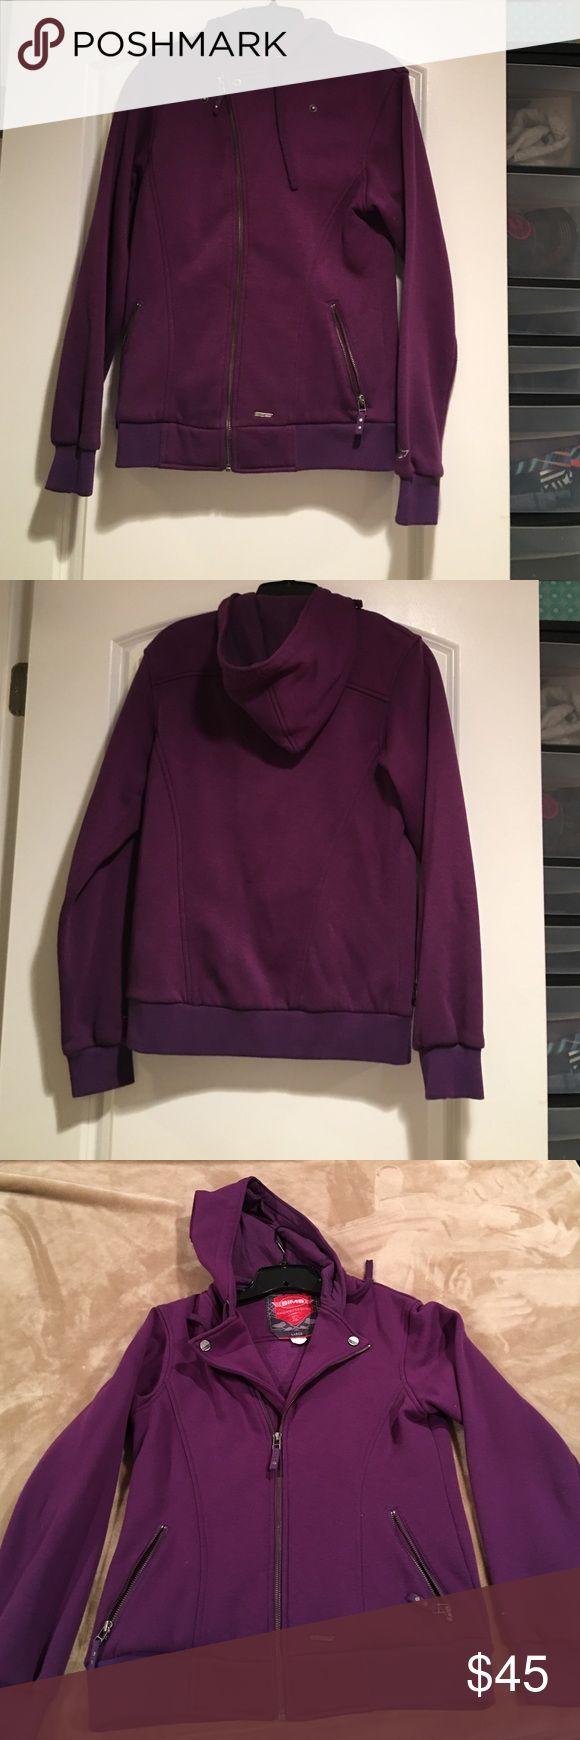 Purple hoodie zip is sweatshirt SIMS Snowboarding brand zip up hooded sweatshirt.  Size large.  Purple, plum color.  Good used condition. Very thick! Sims Snowboarding Tops Sweatshirts & Hoodies